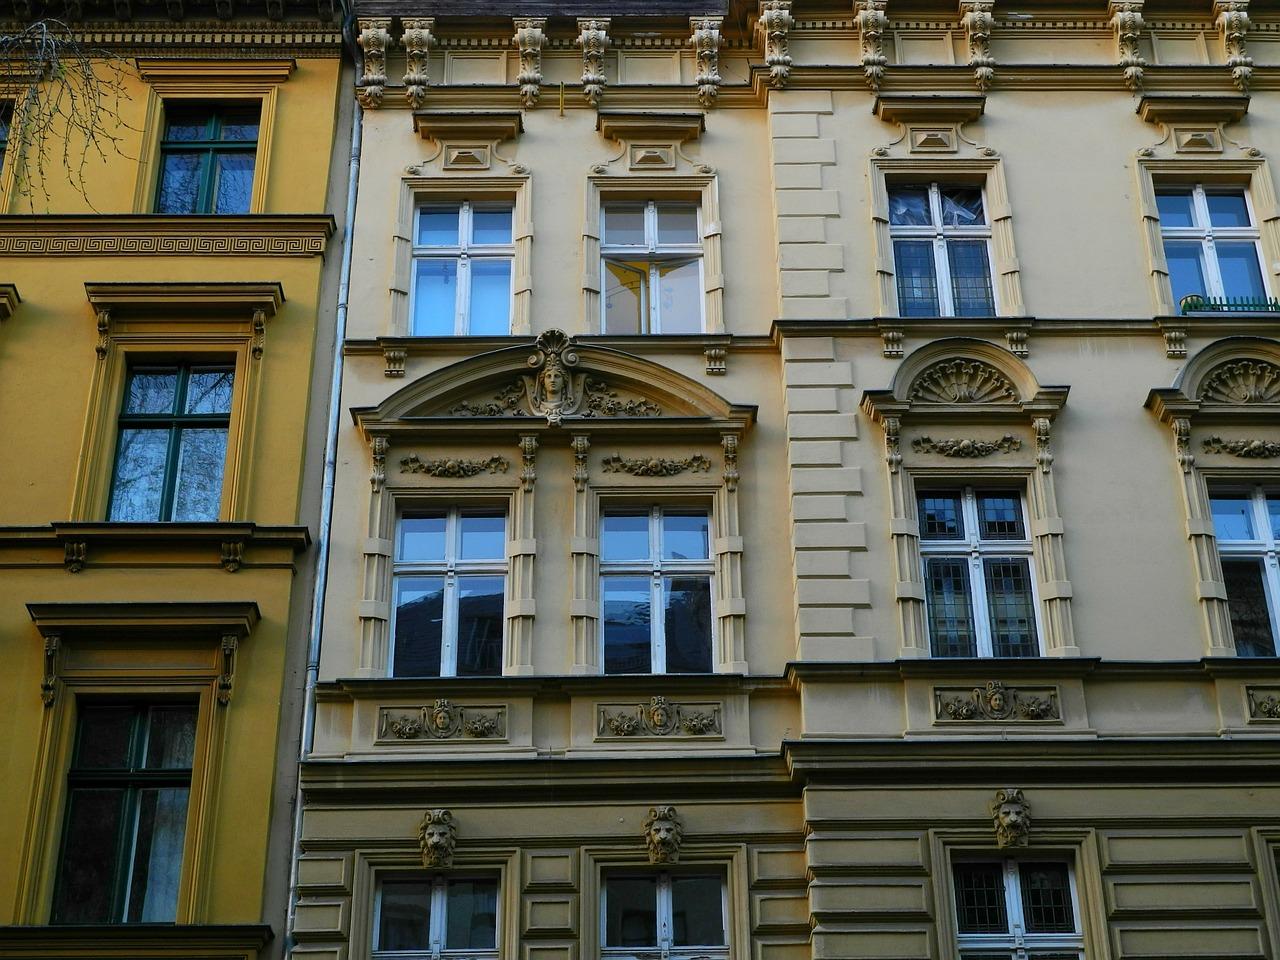 berlin-325054_1280